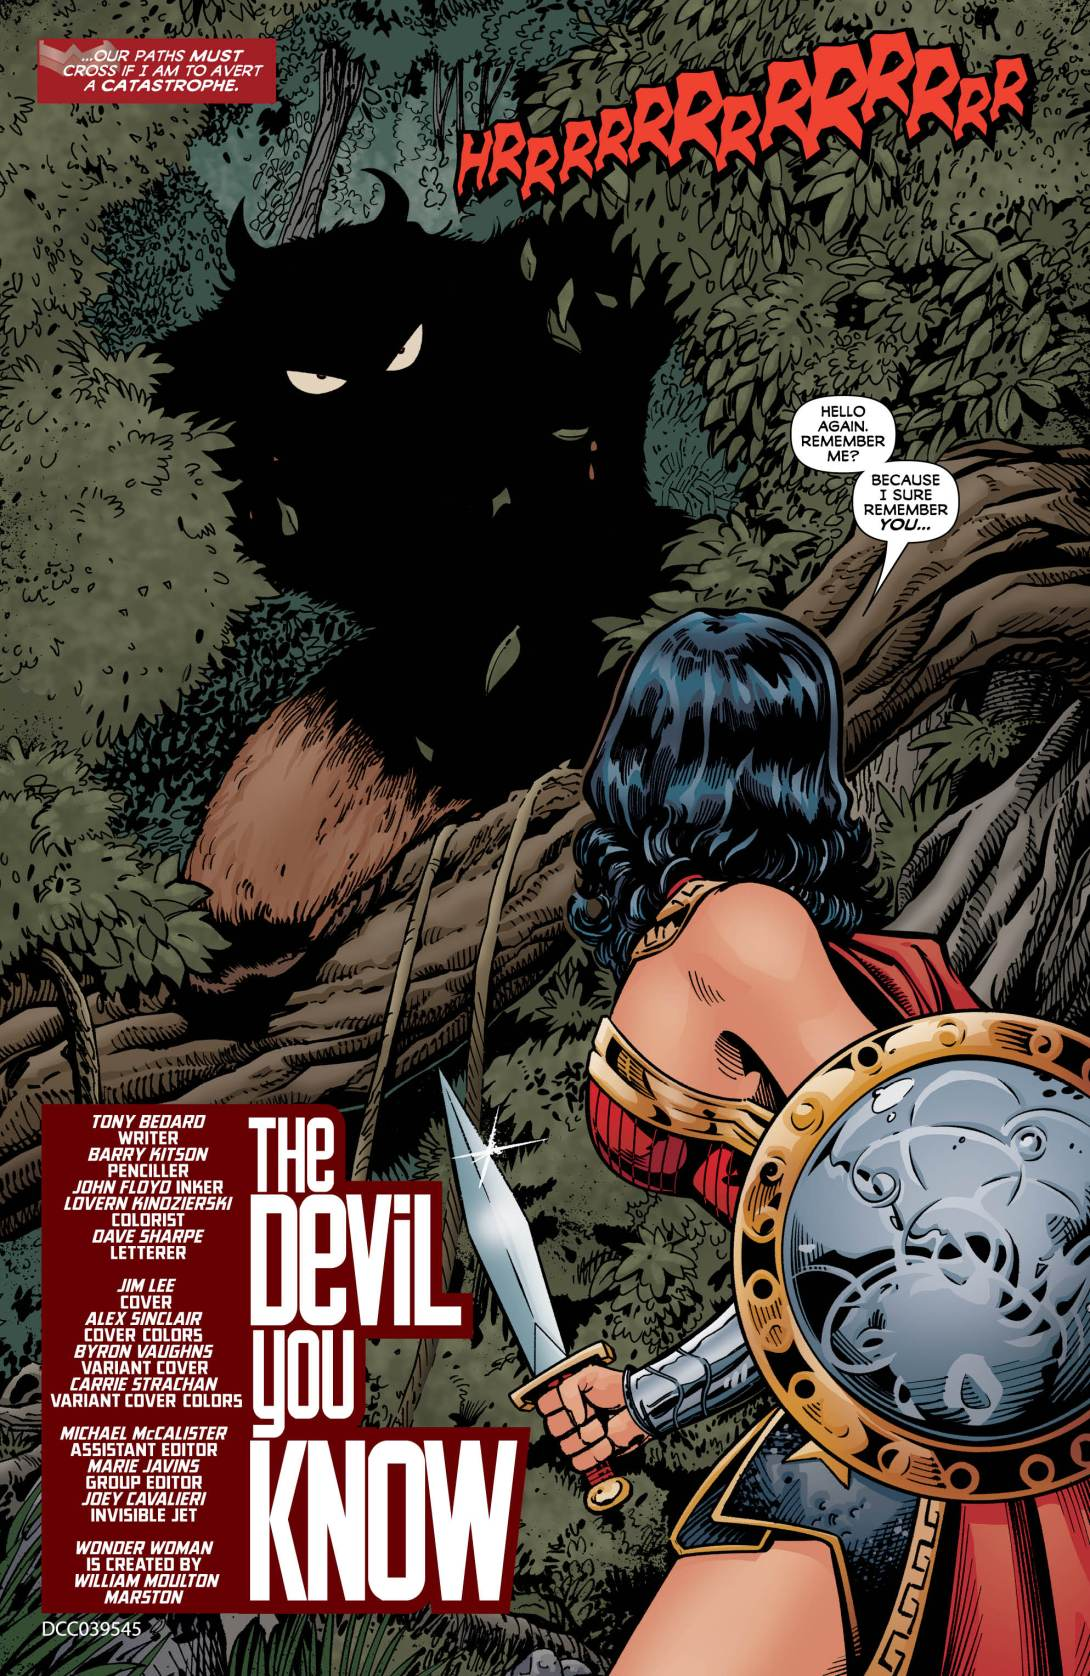 Wonder Woman Taz 2 - DC Comics News